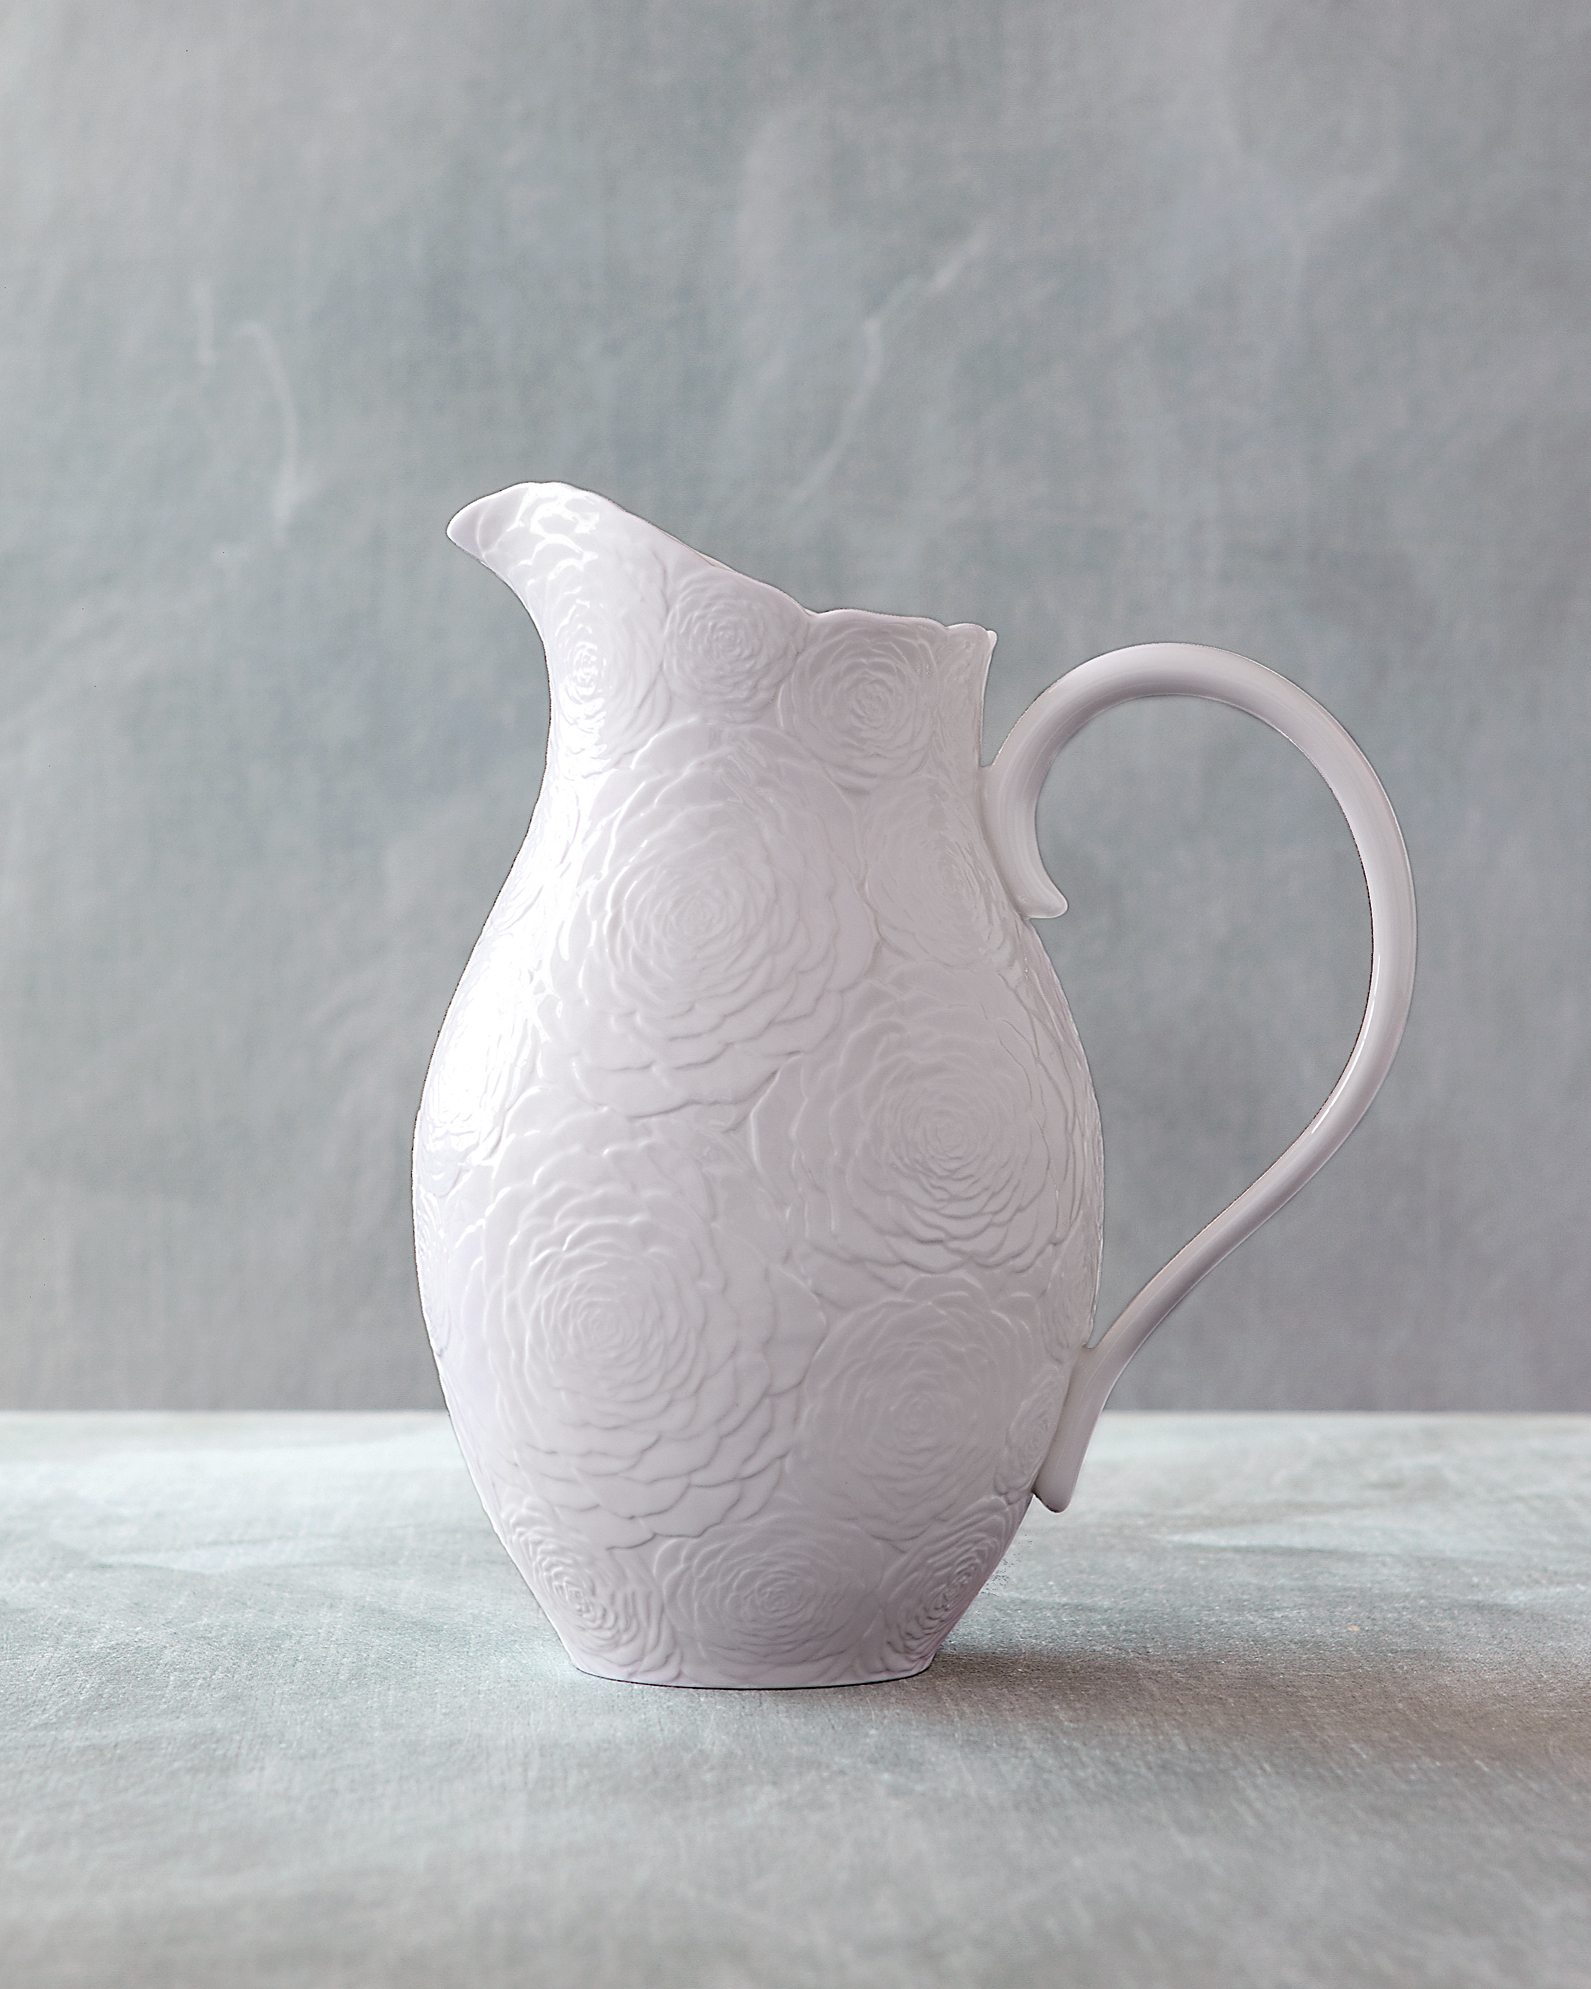 pitcher-0811mwd107434.jpg